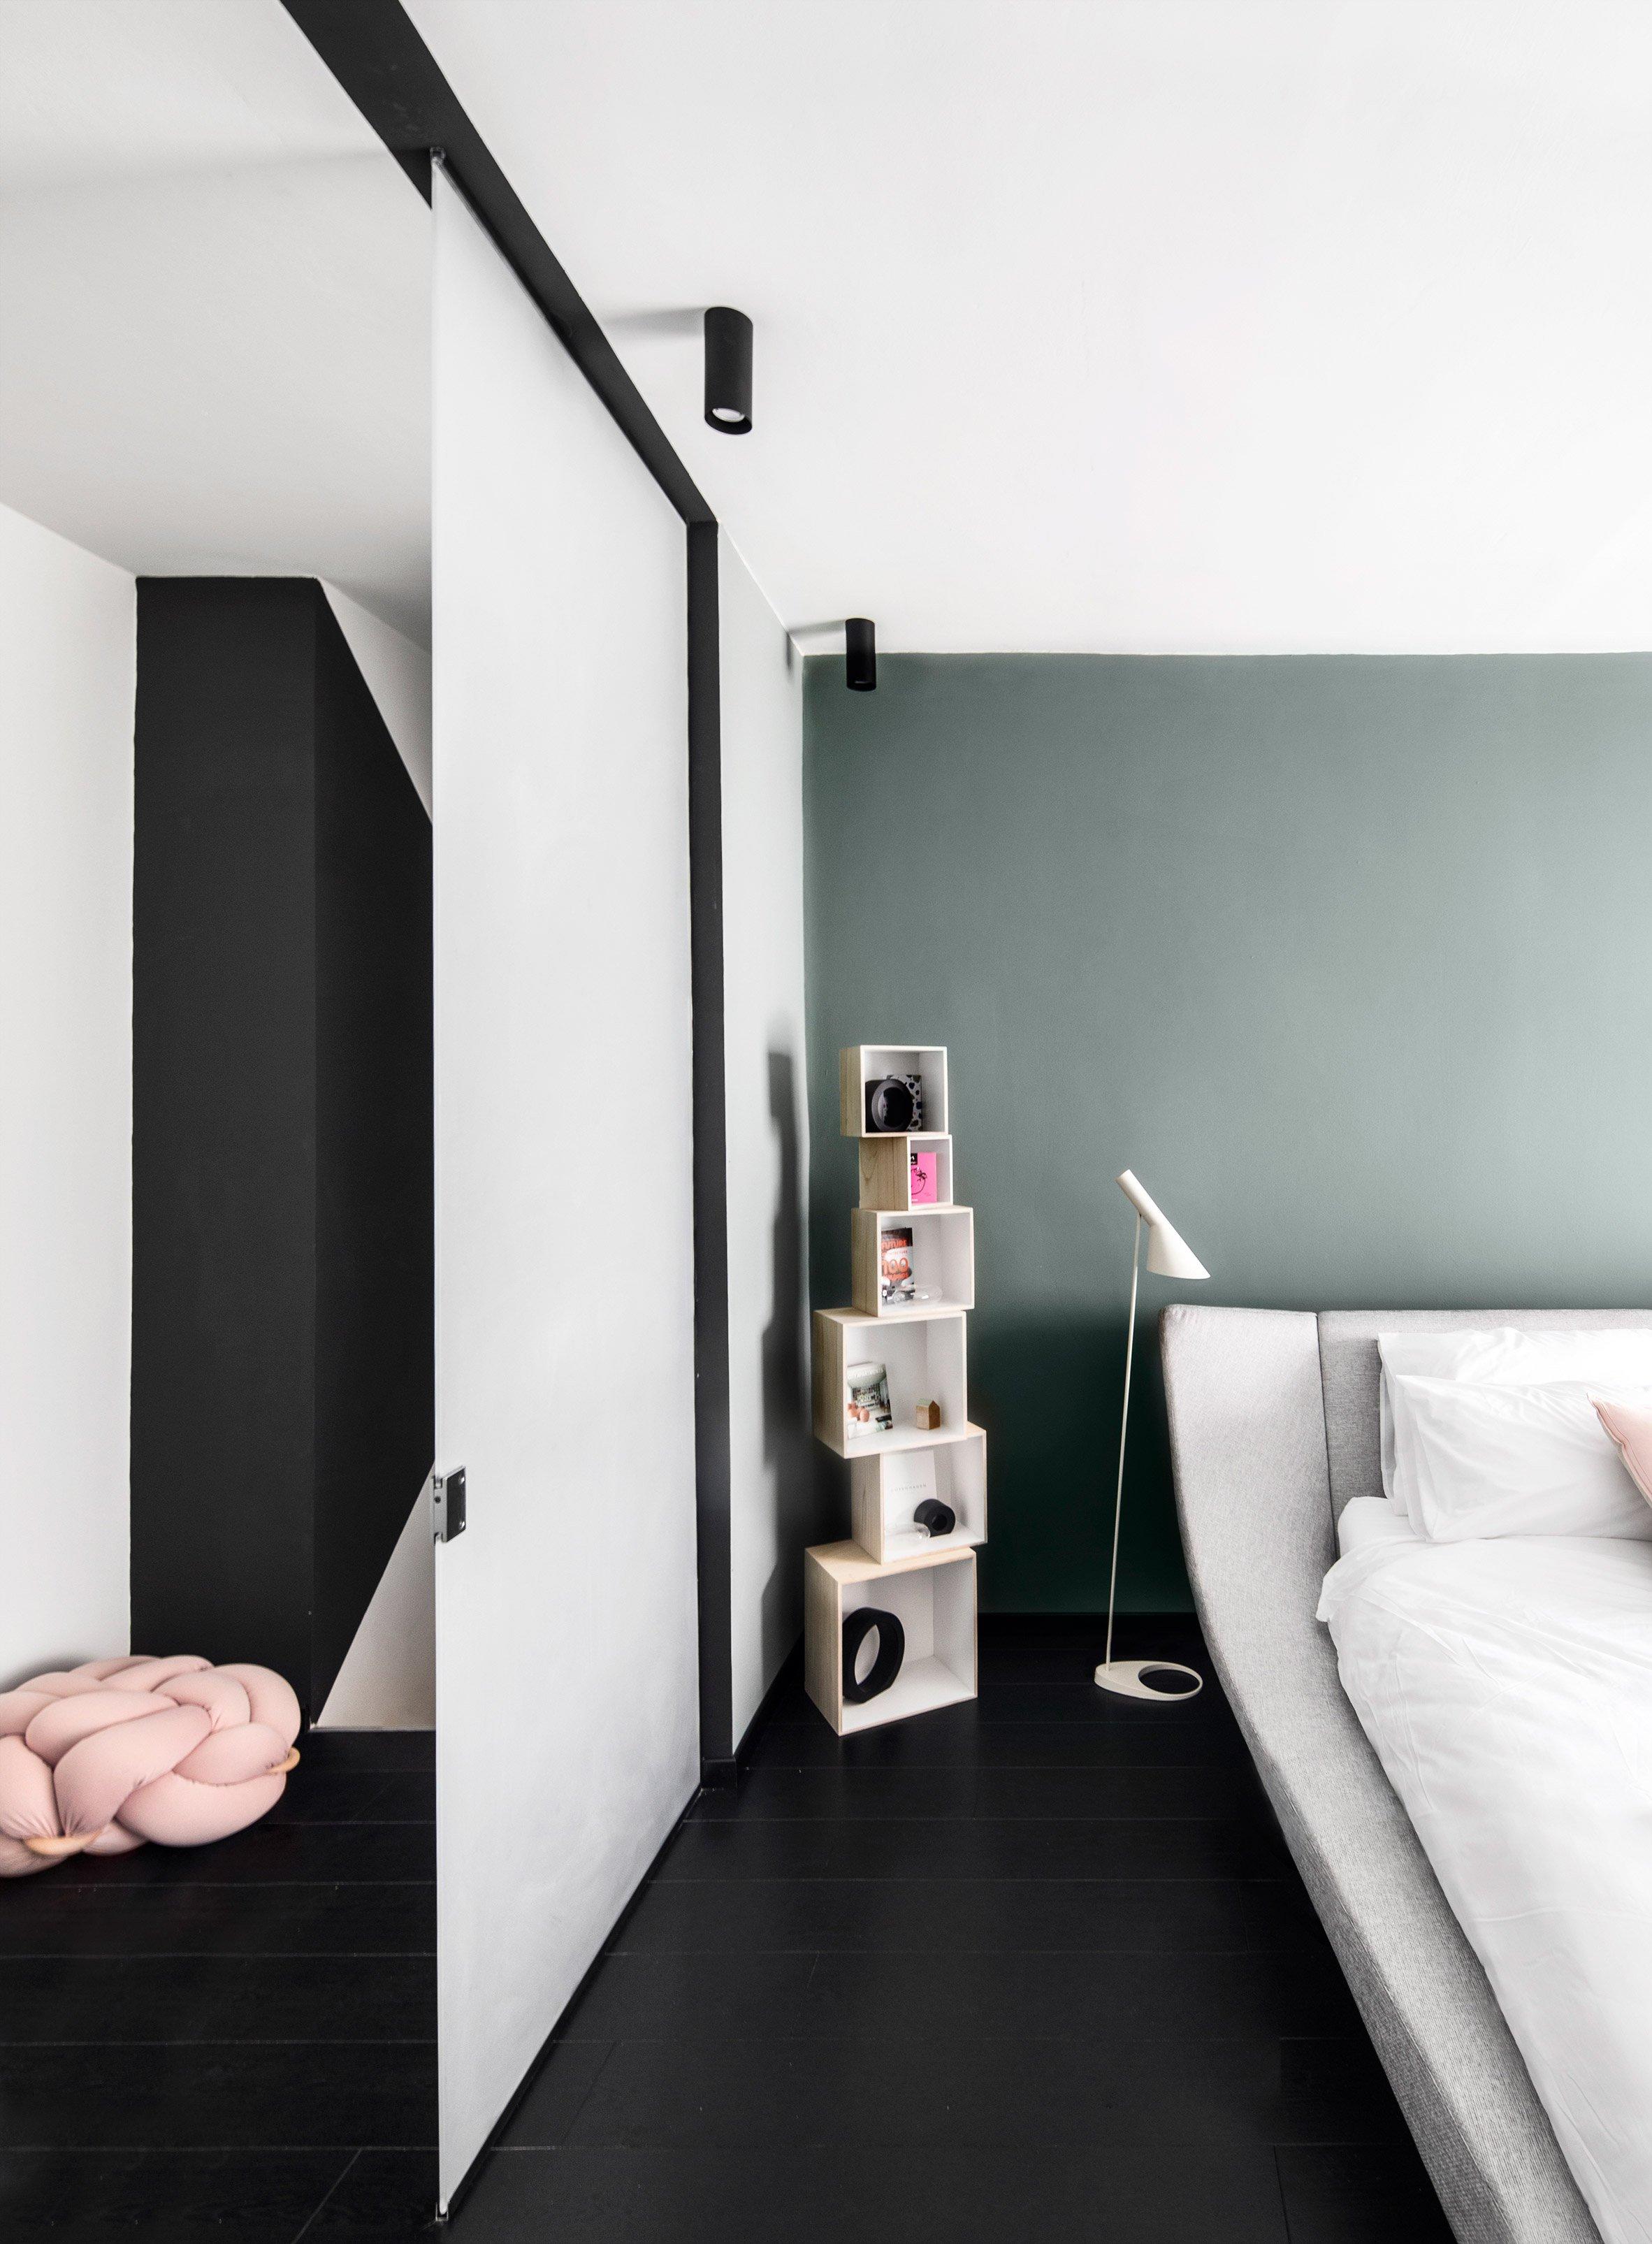 residence-interiors-design-studia-osnovadesign-osnova-poltava_09